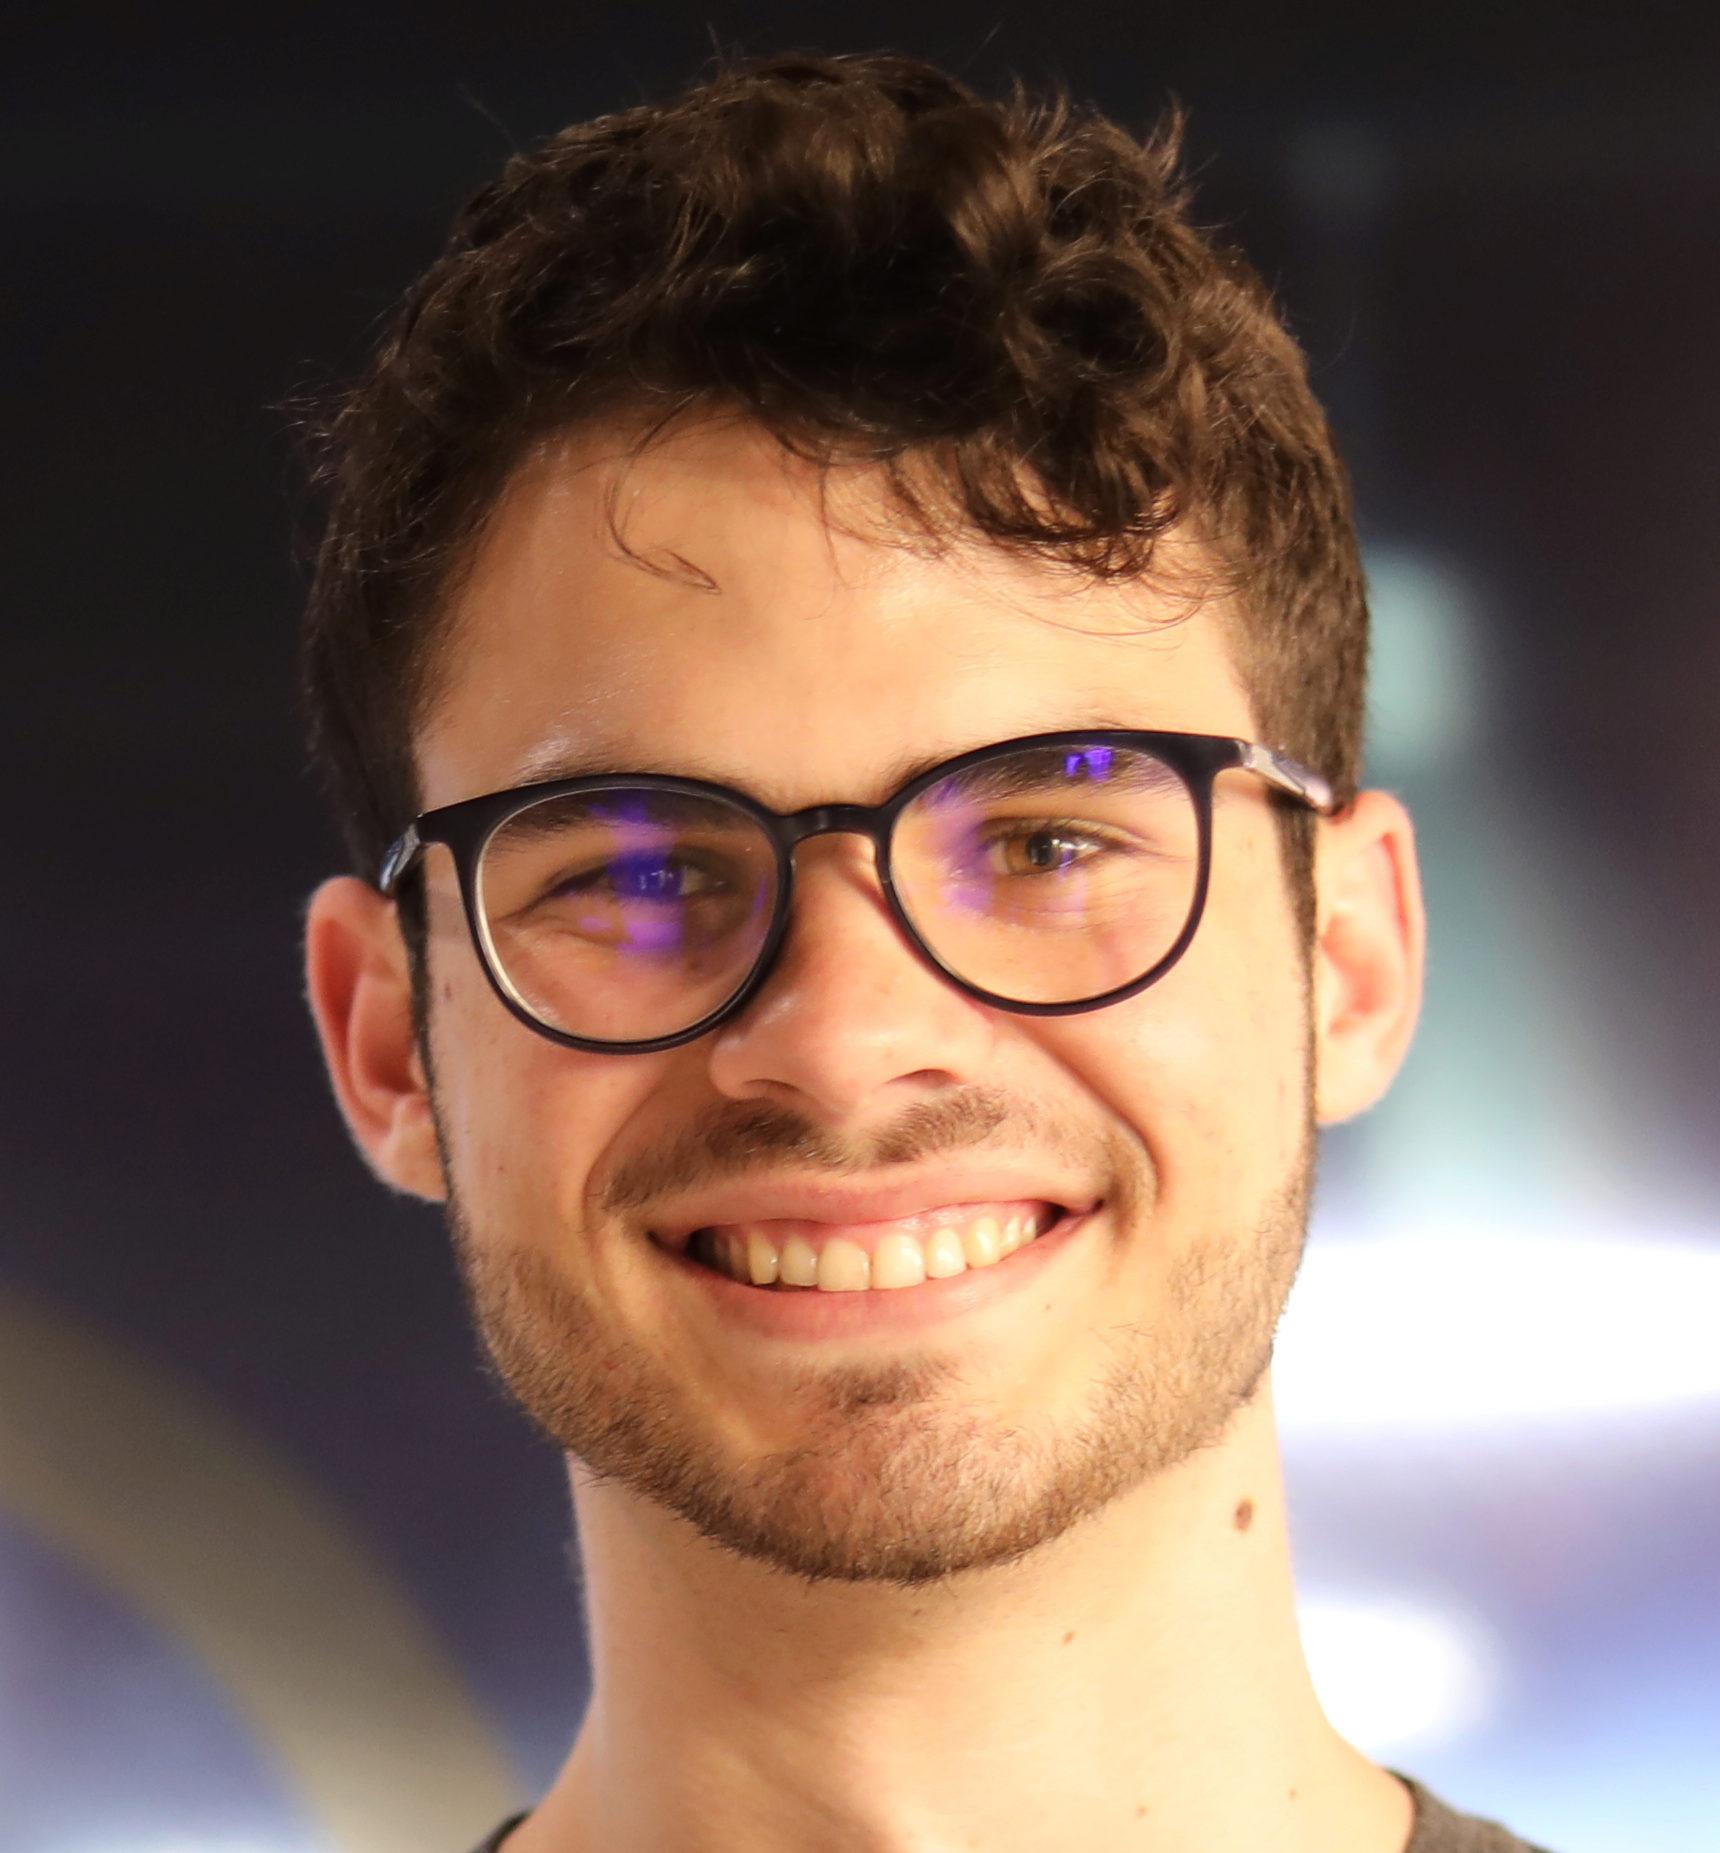 Mauricio Daros Andrade